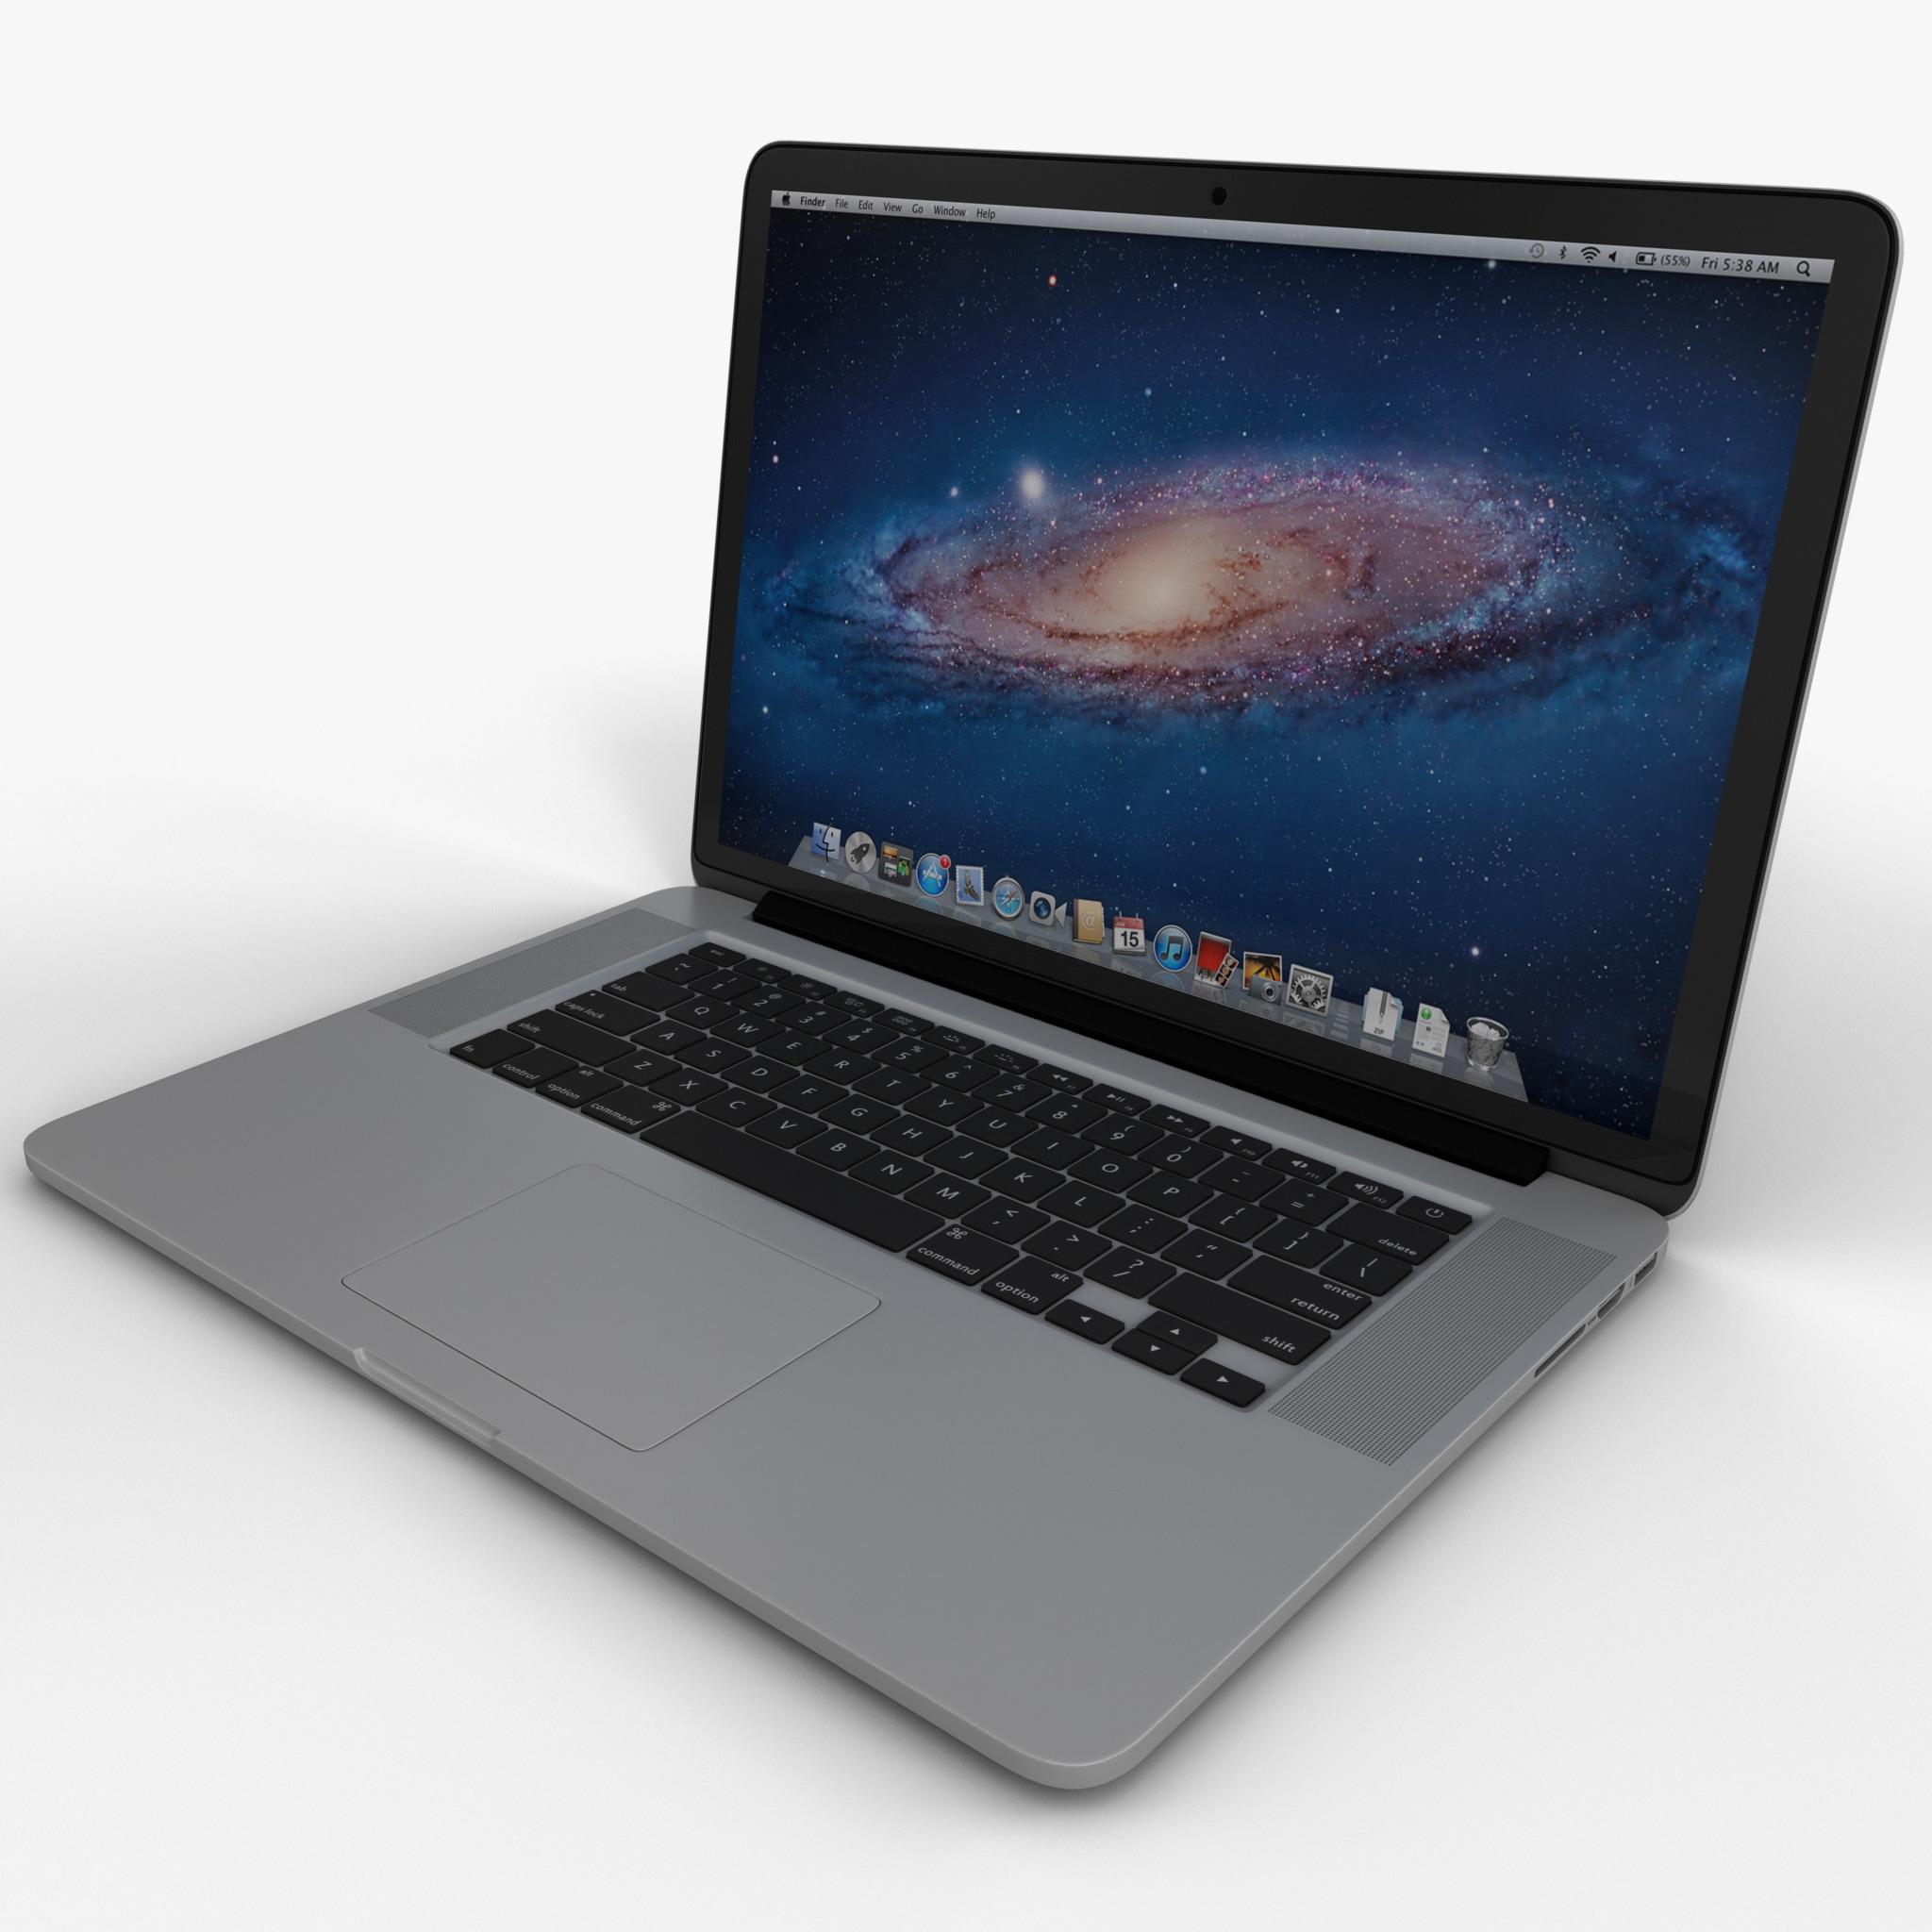 3d macbook pro retina display